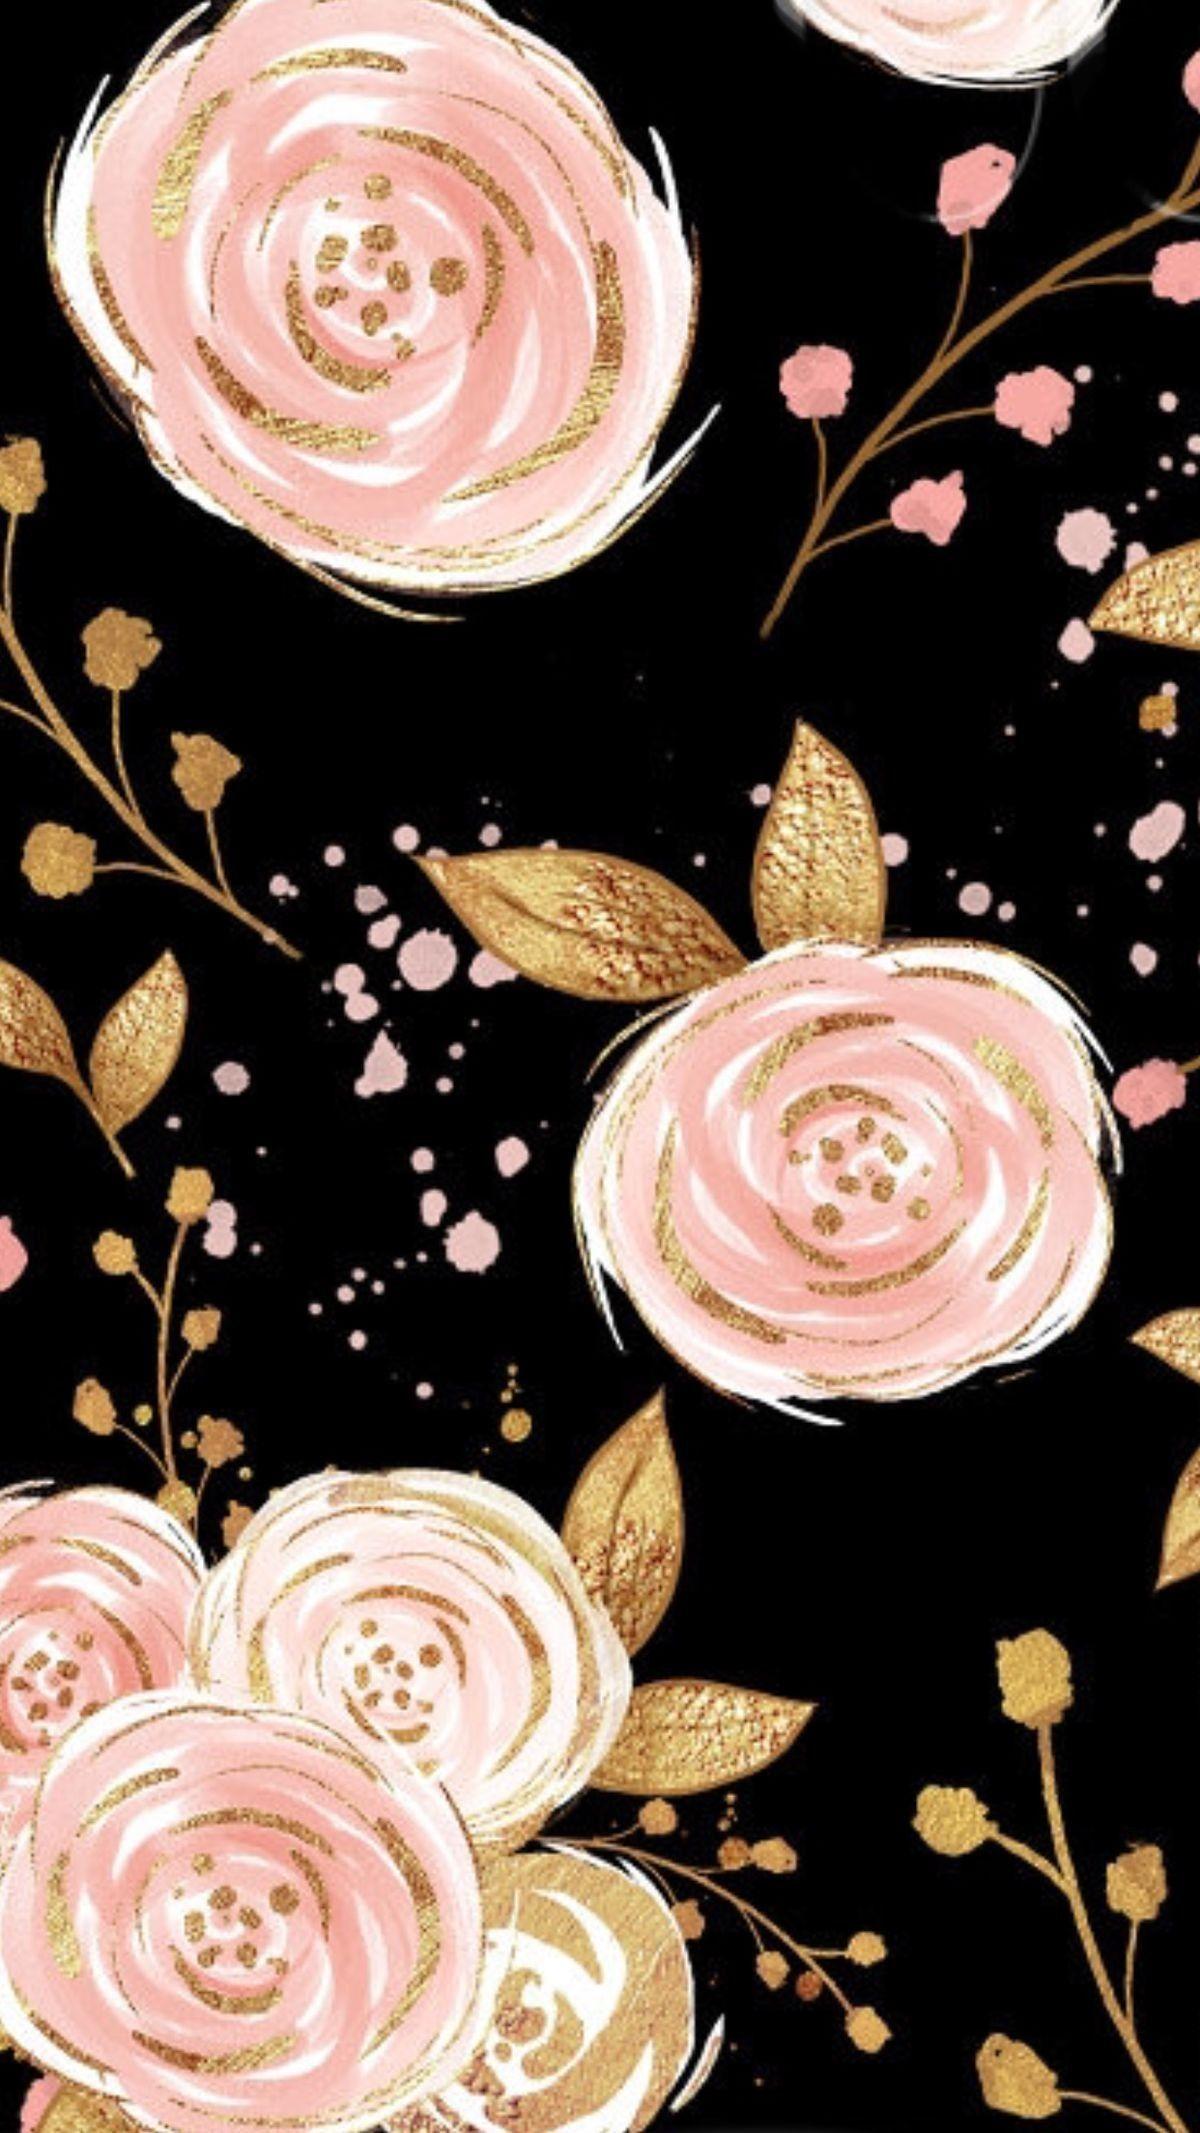 Rose Gold Artsy Rose Gold Cute Phone Wallpapers Gold Wallpaper Background Rose Gold Wallpaper Gold Wallpaper Iphone